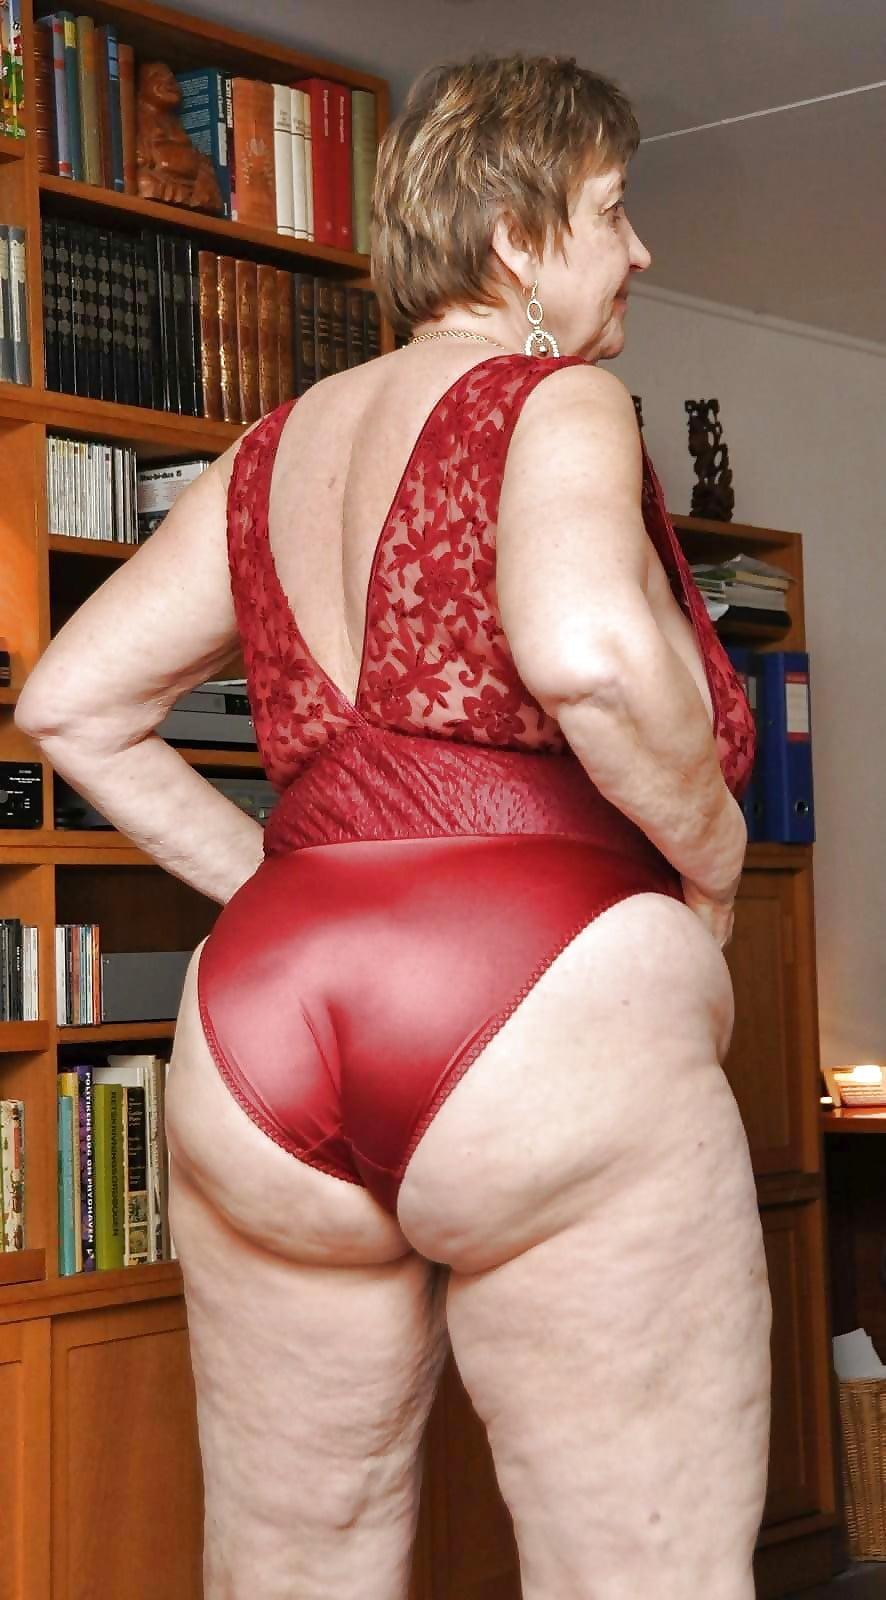 aunty-buttocks-granny-butt-tgp